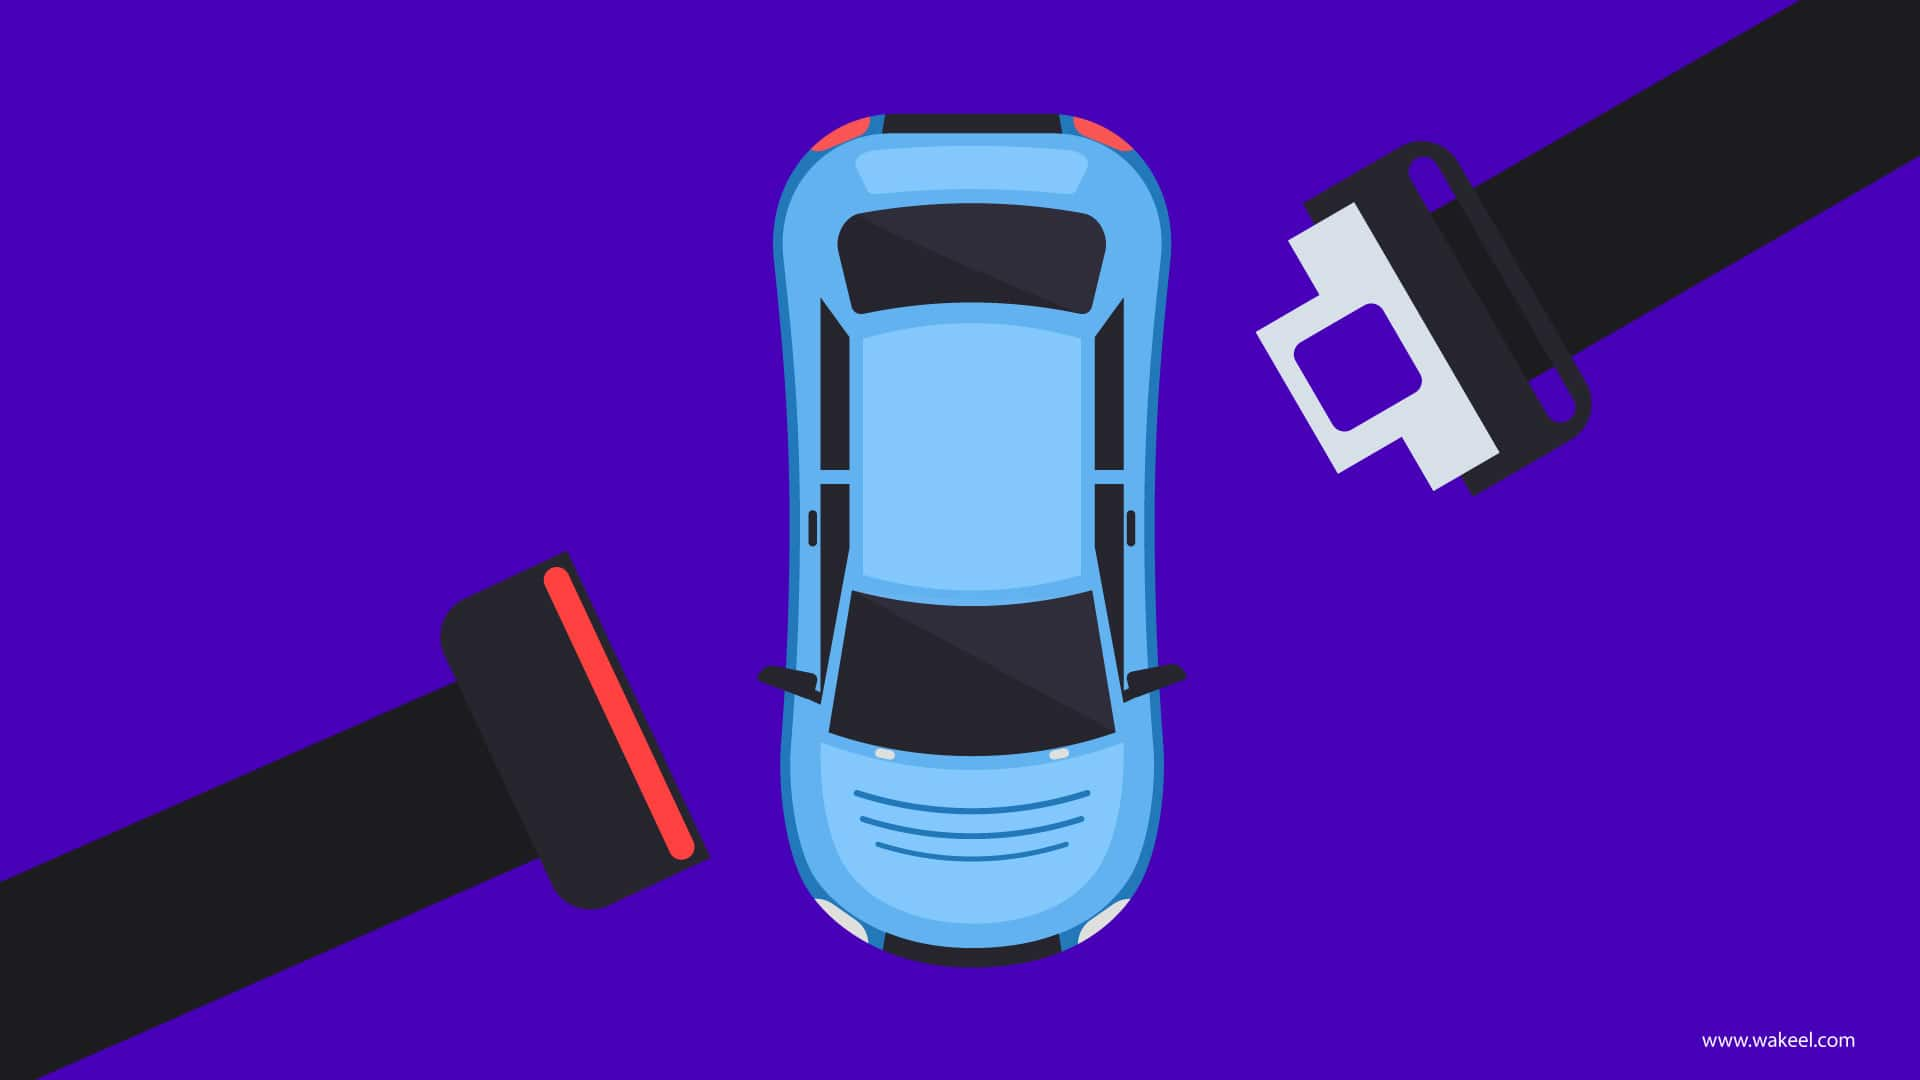 3 Benefits of Having Car Insurance in Saudi Arabia